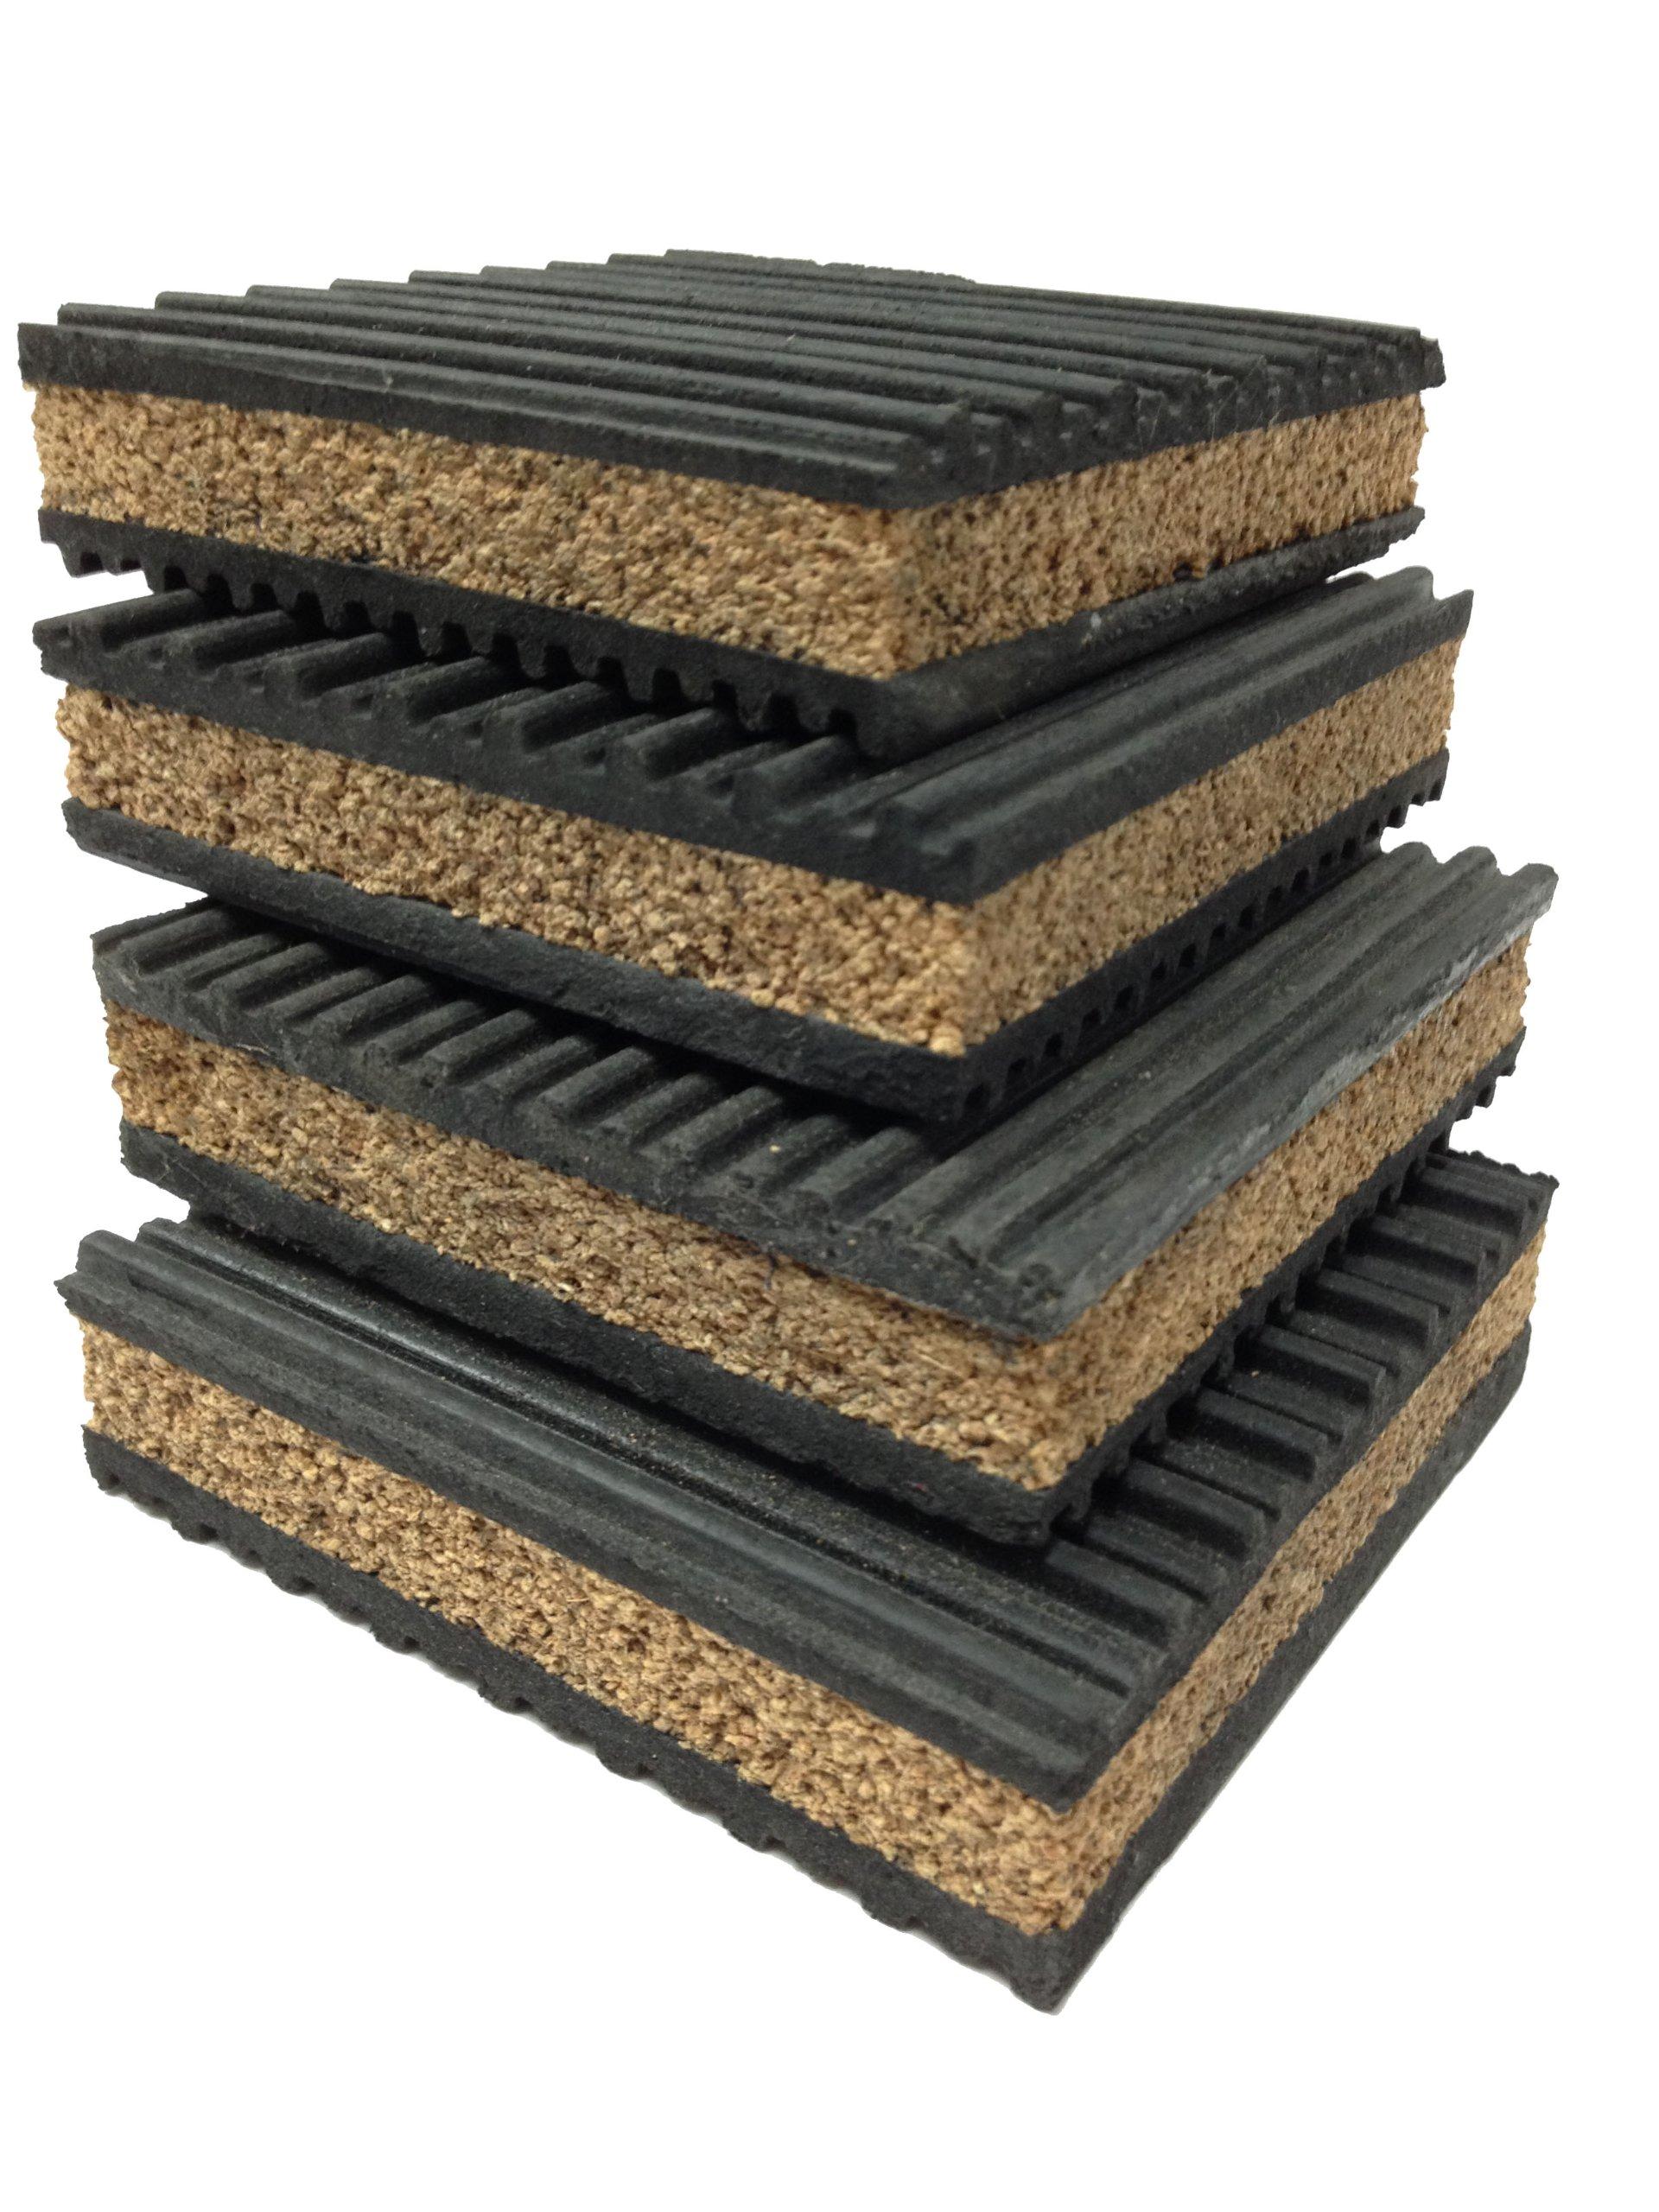 4 Pack of Anti Vibration Pads 4'' x 4'' x 7/8'' Rubber/Cork Vibration isolation pads